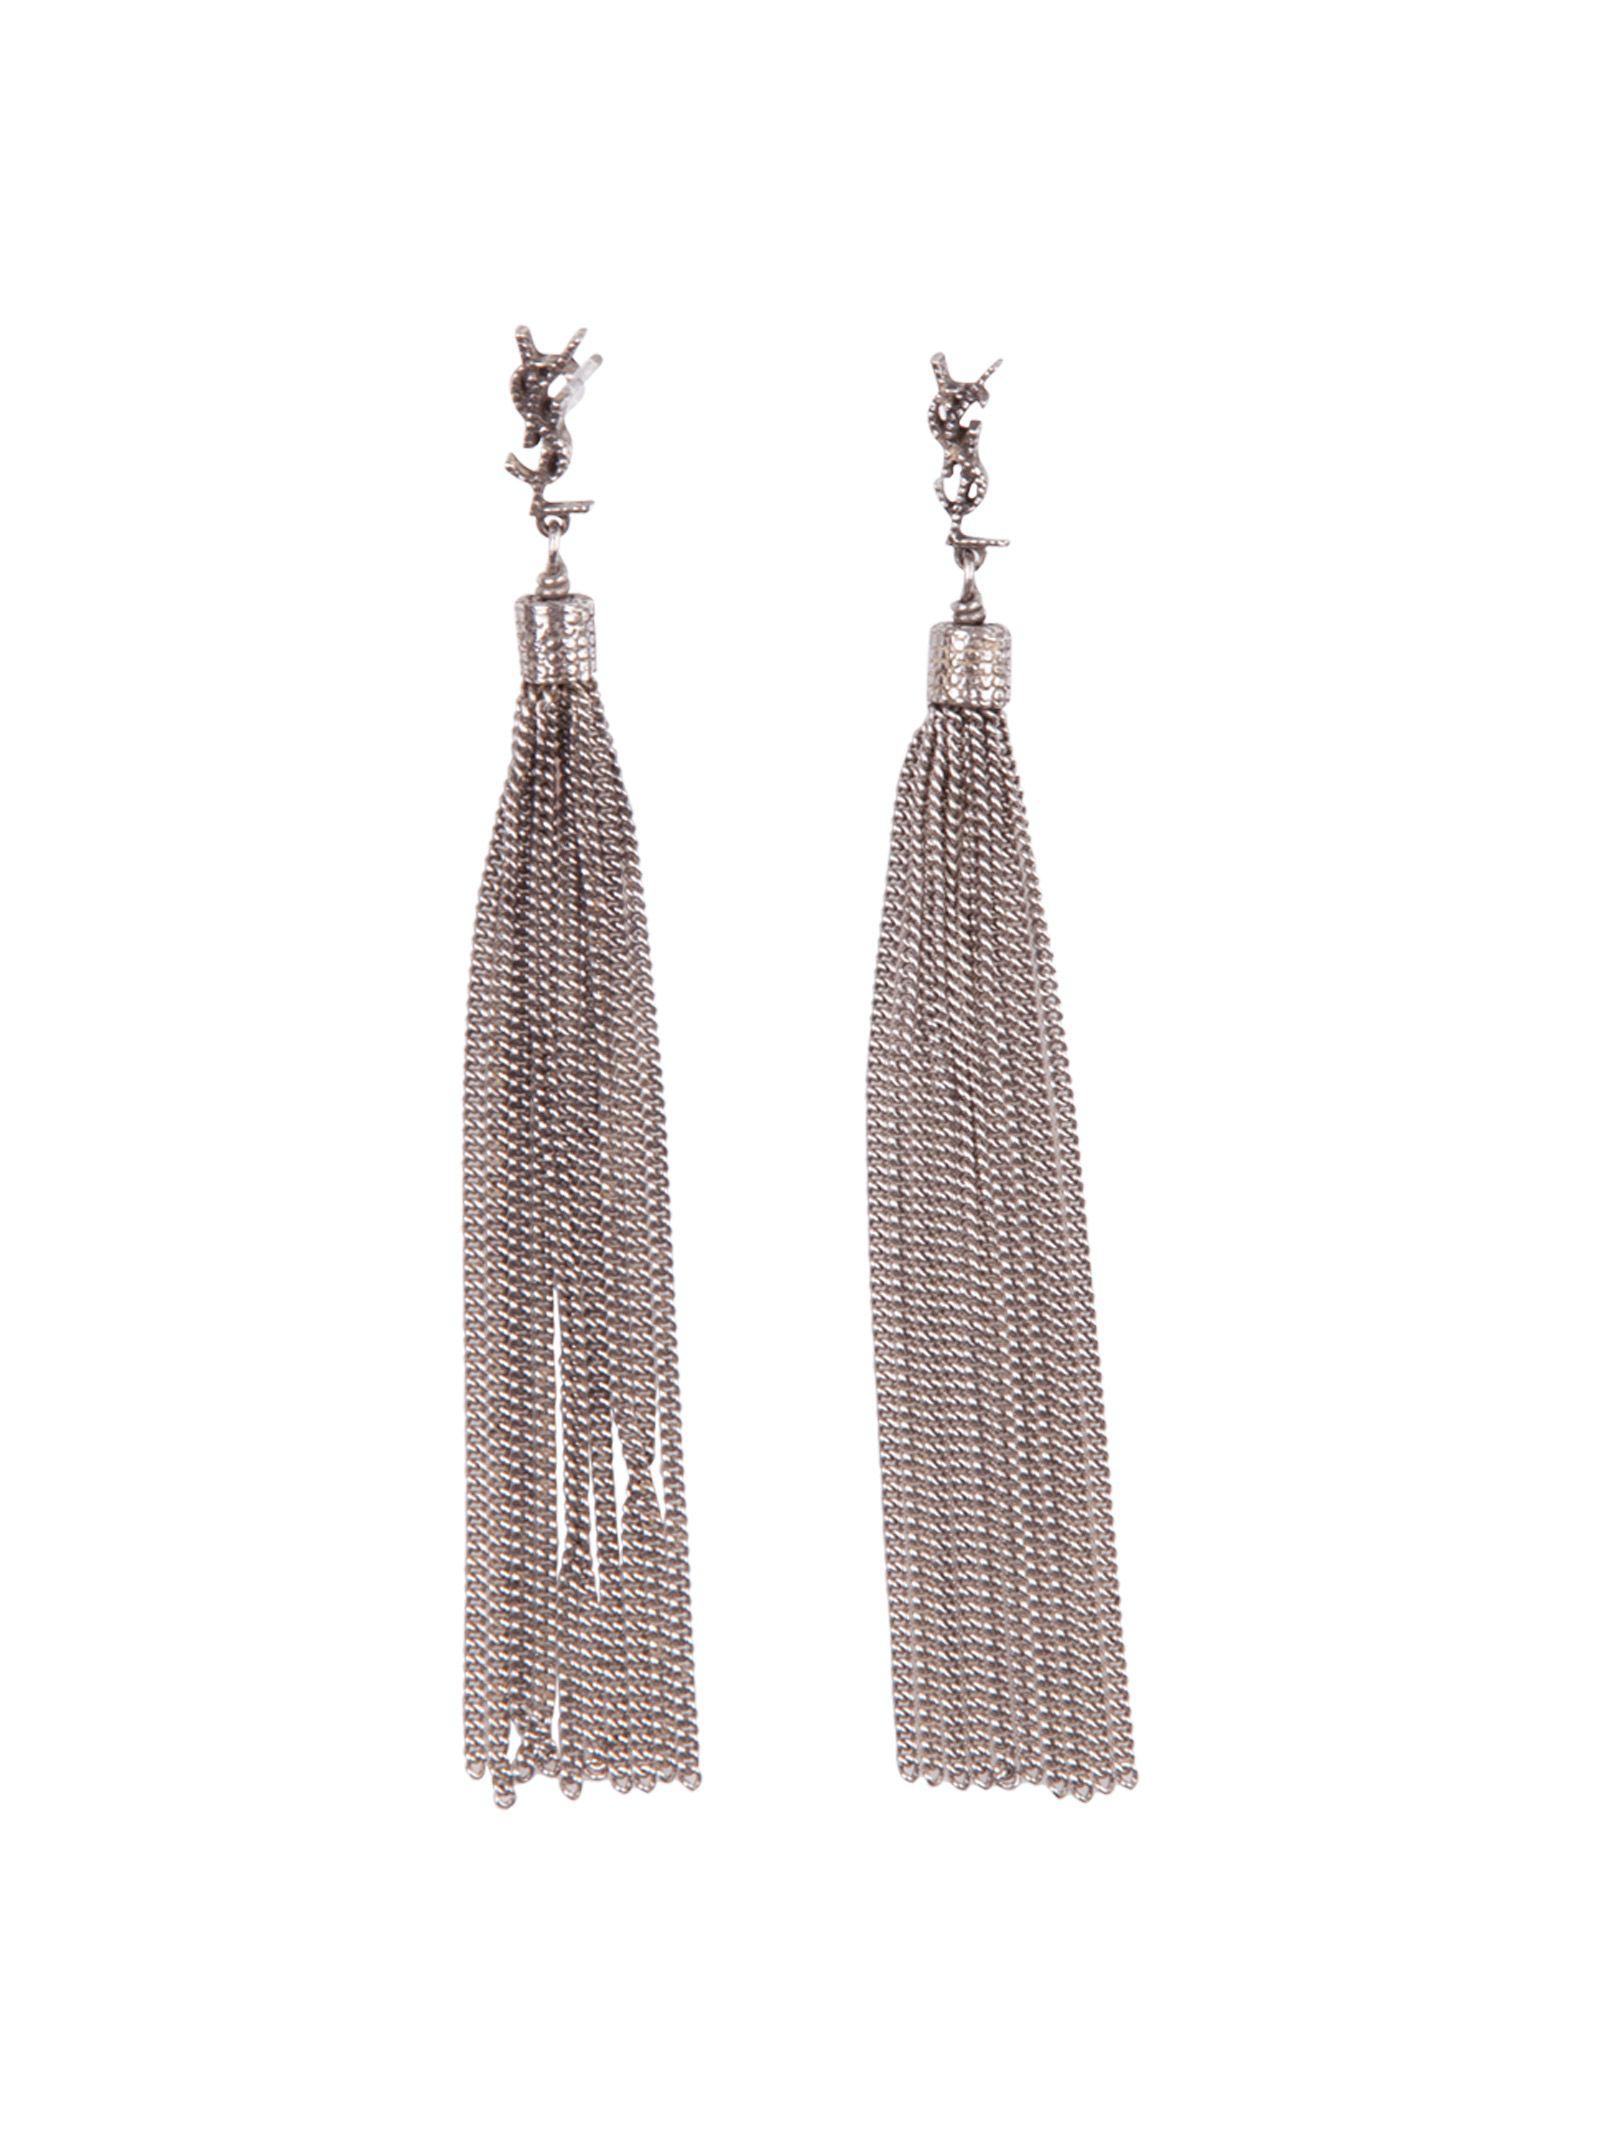 Saint Laurent Earrings In Silver